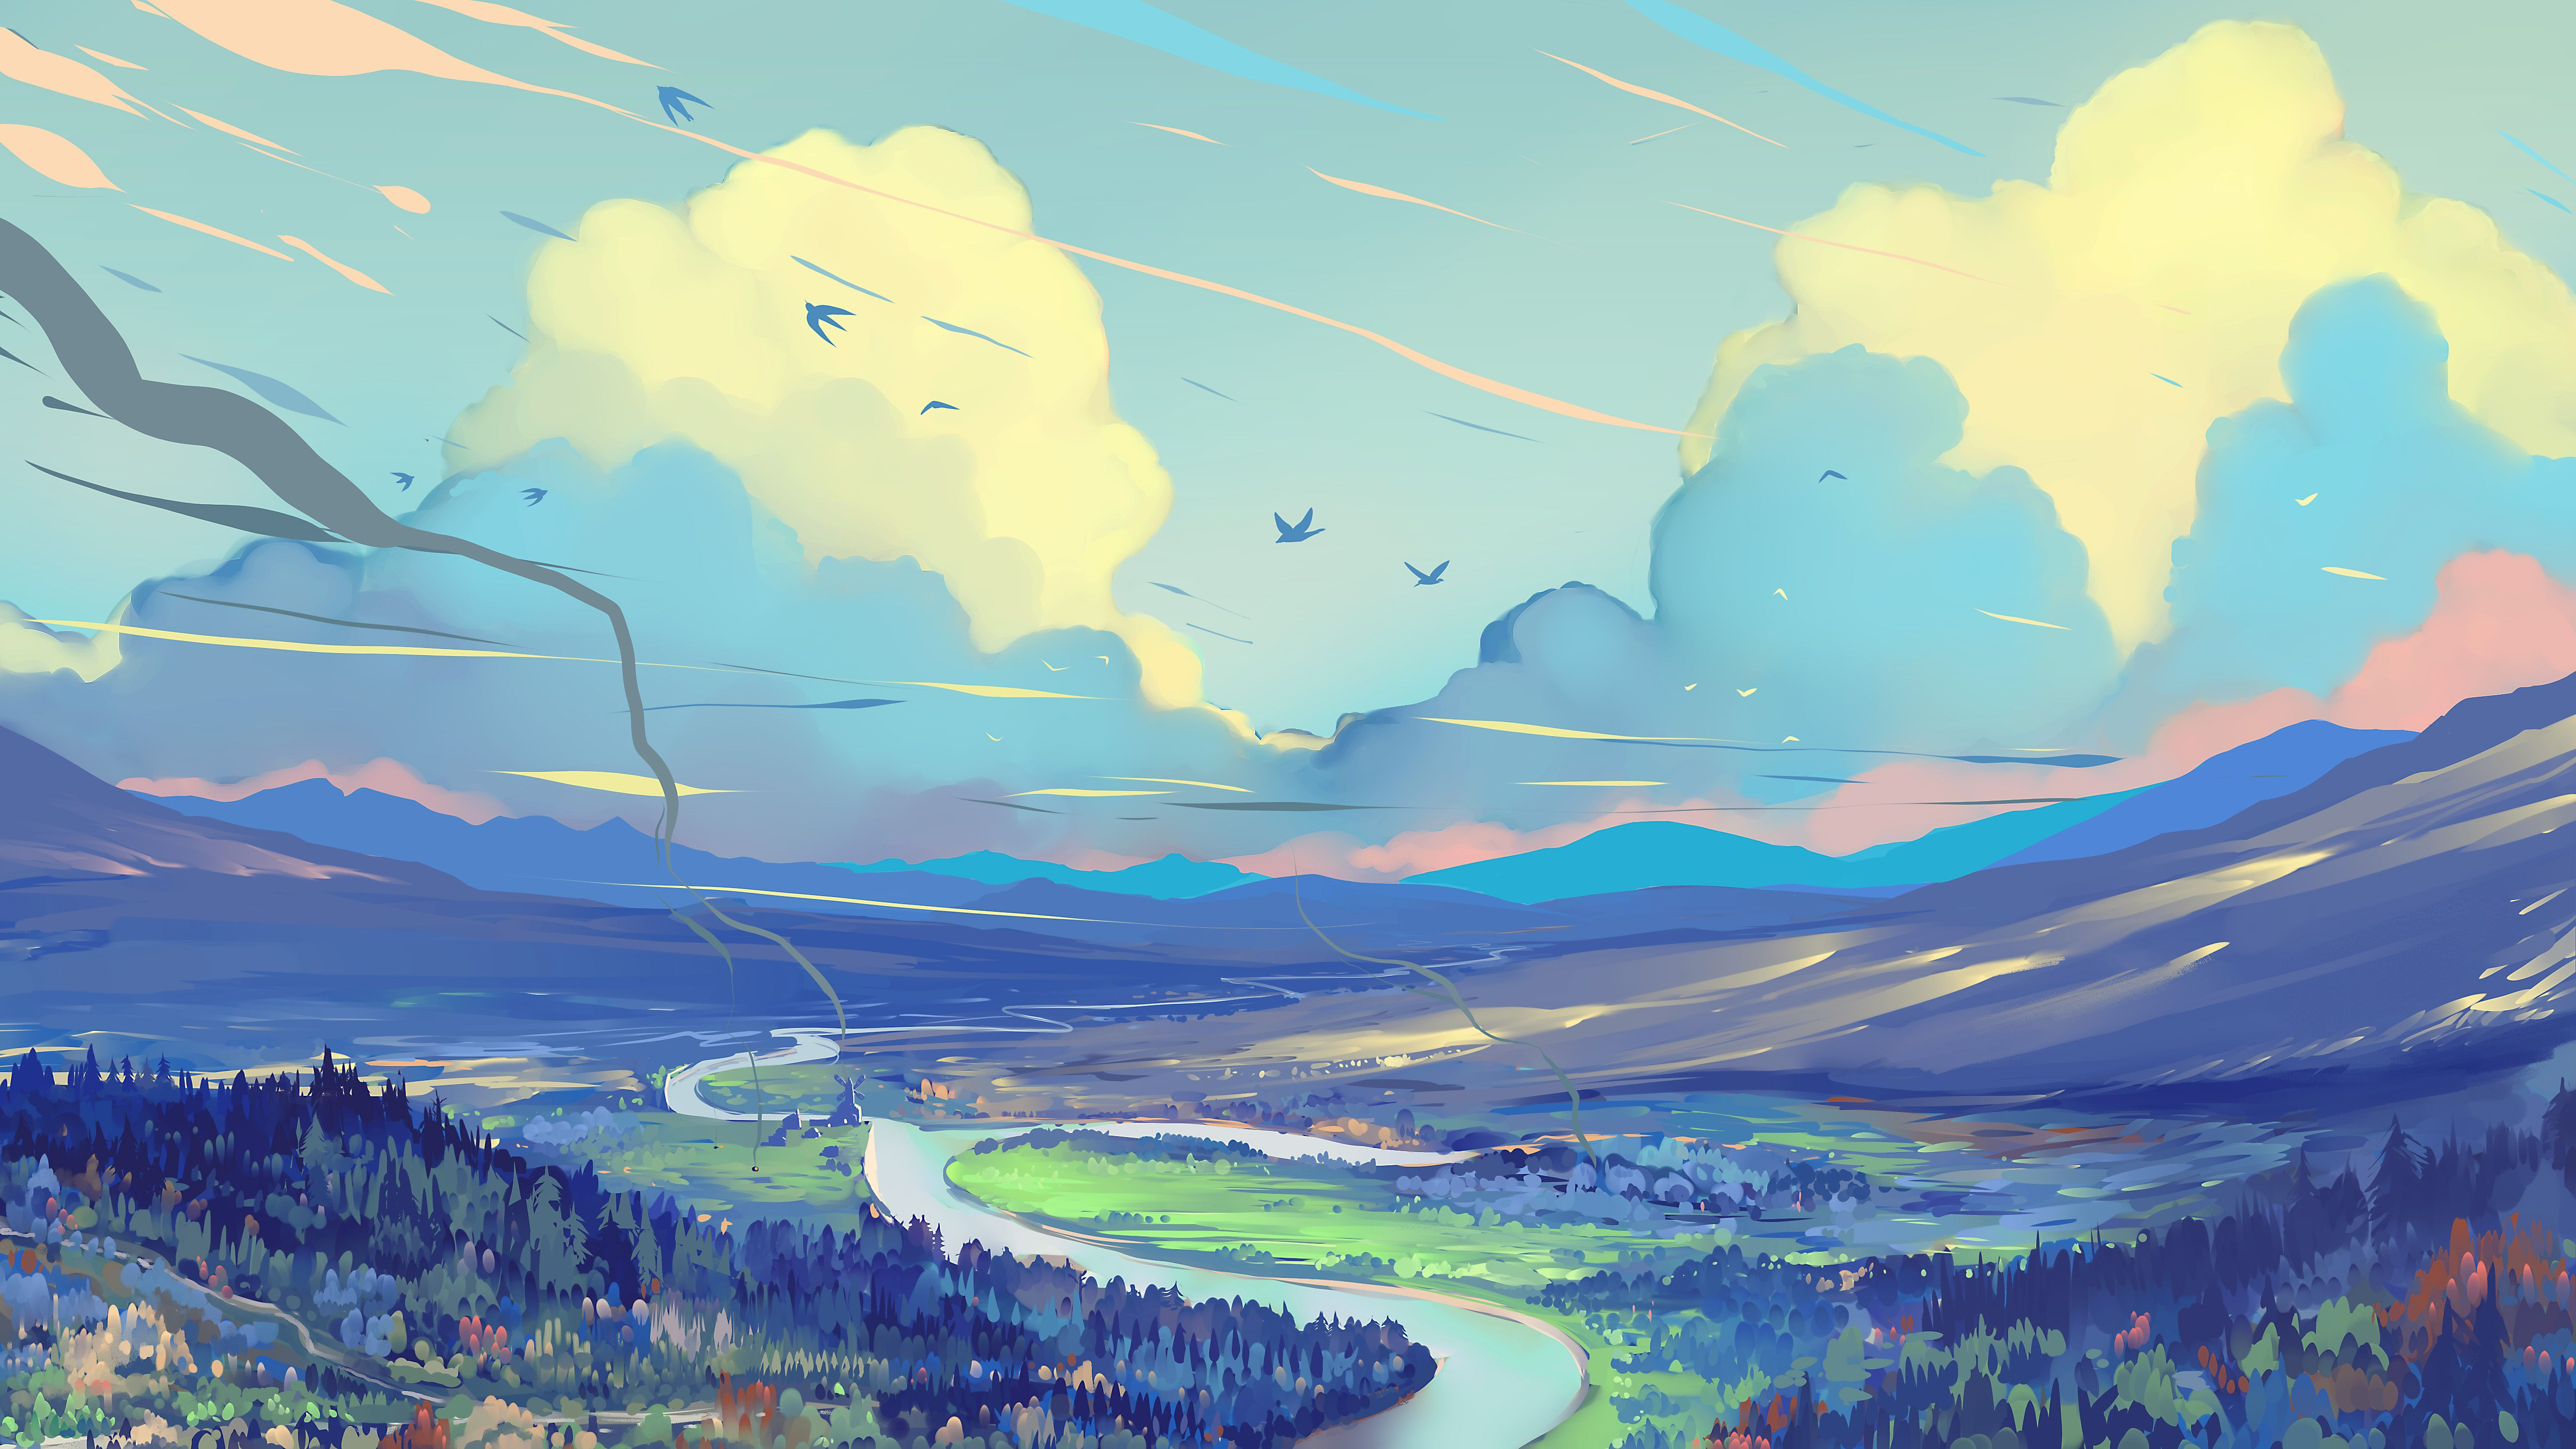 White Blue Red Clouds / Hangmoon [51202880] Landscape